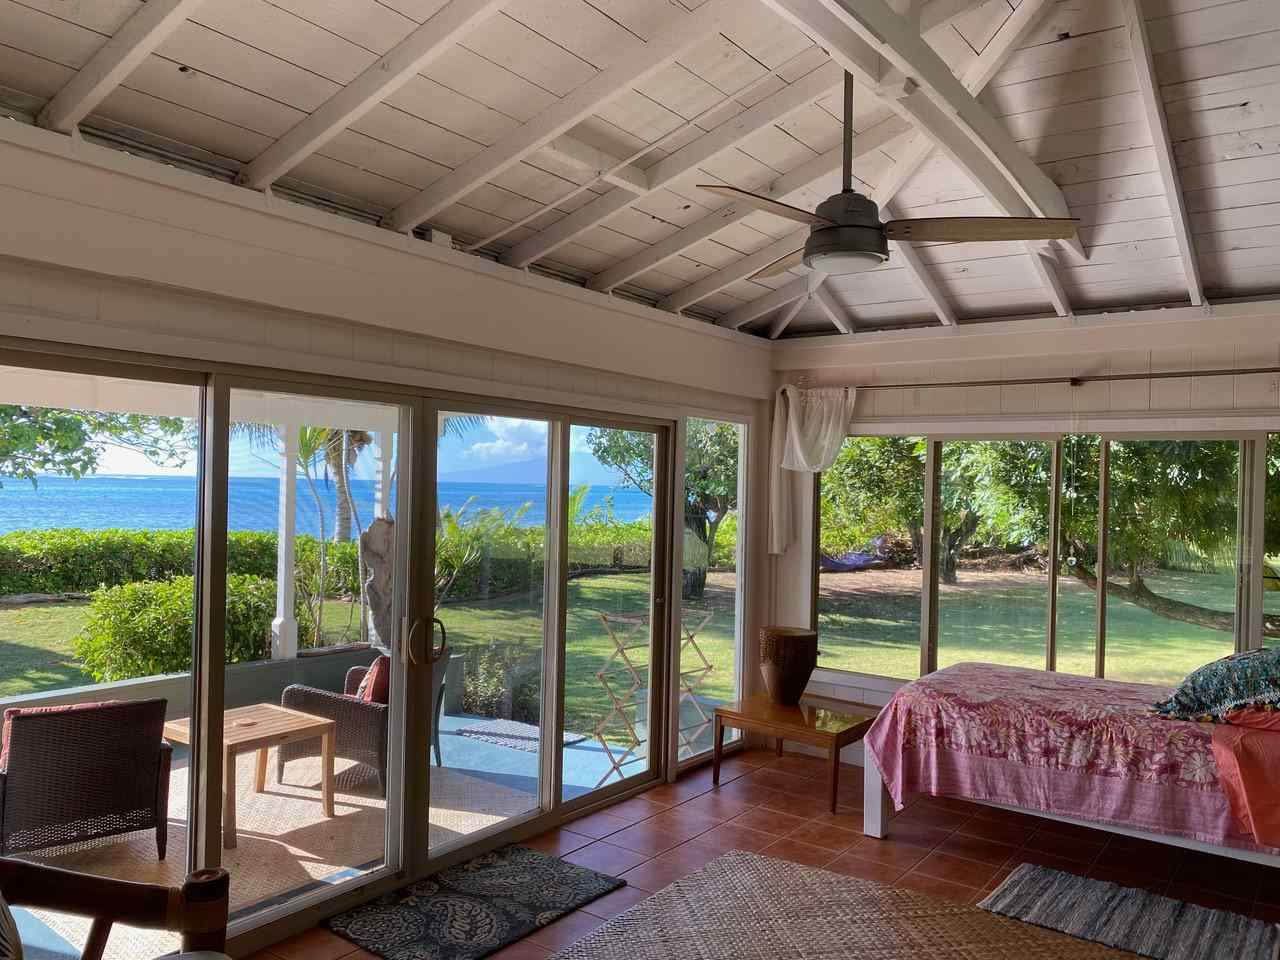 8714 Kamehameha V Hwy - Photo 1